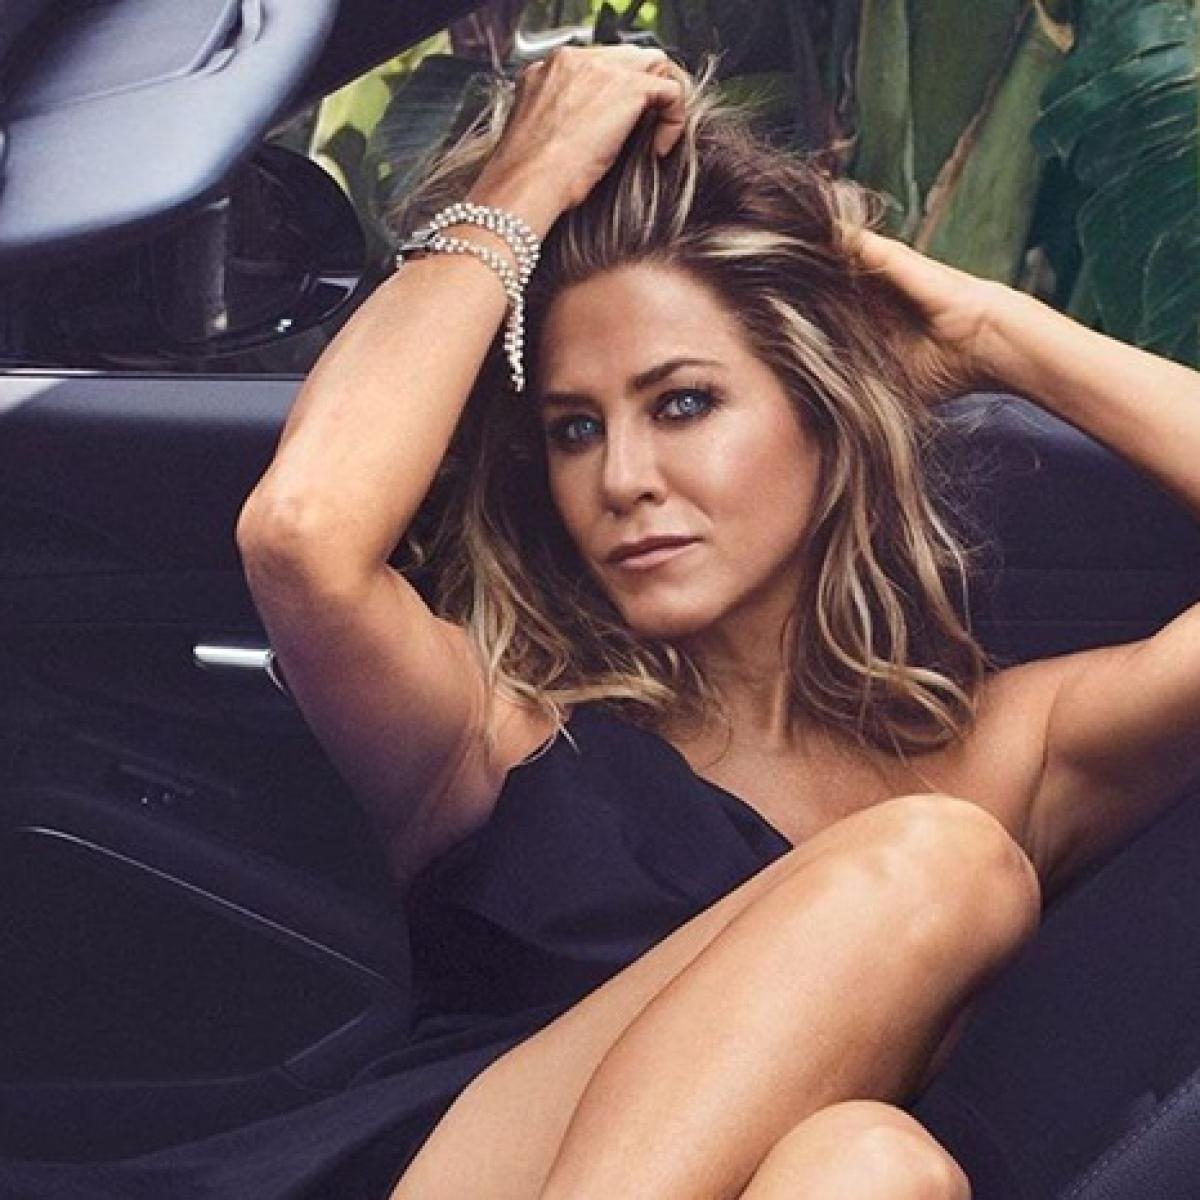 I wanted to play Wonder Woman but I waited too long: Jennifer Aniston